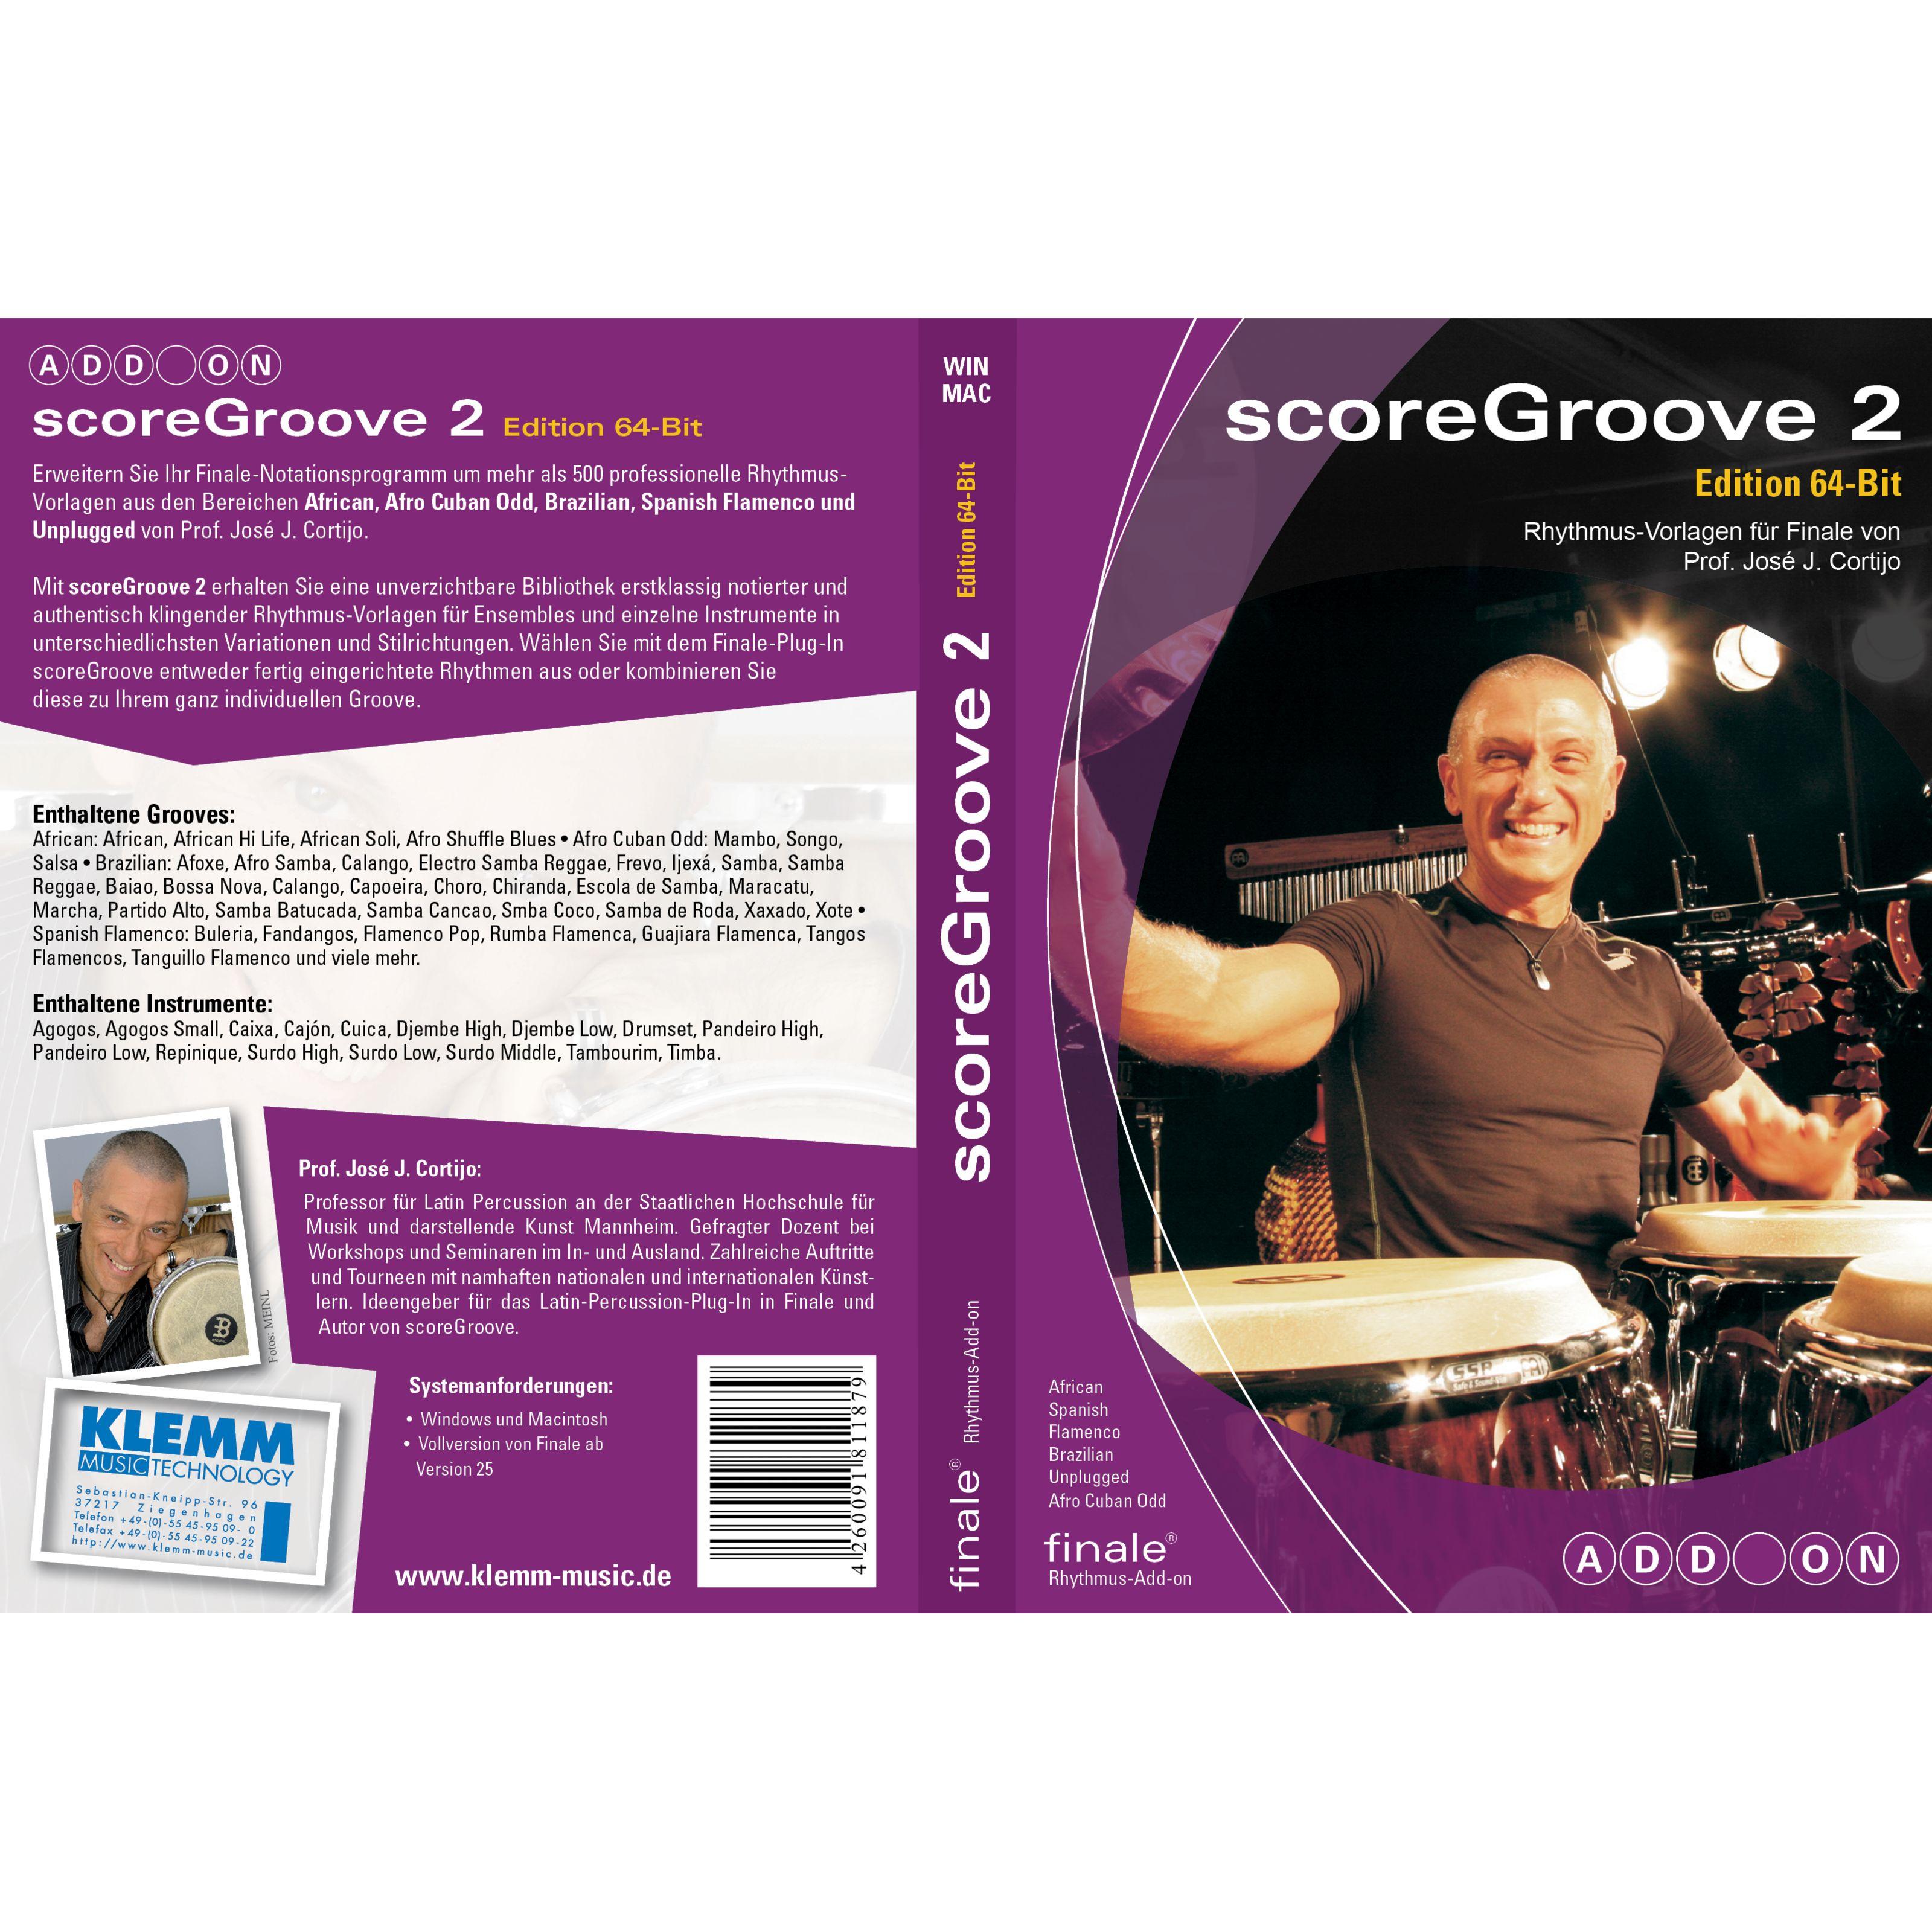 MakeMusic - scoreGroove Vol.2 Groove-Add-On für Finale